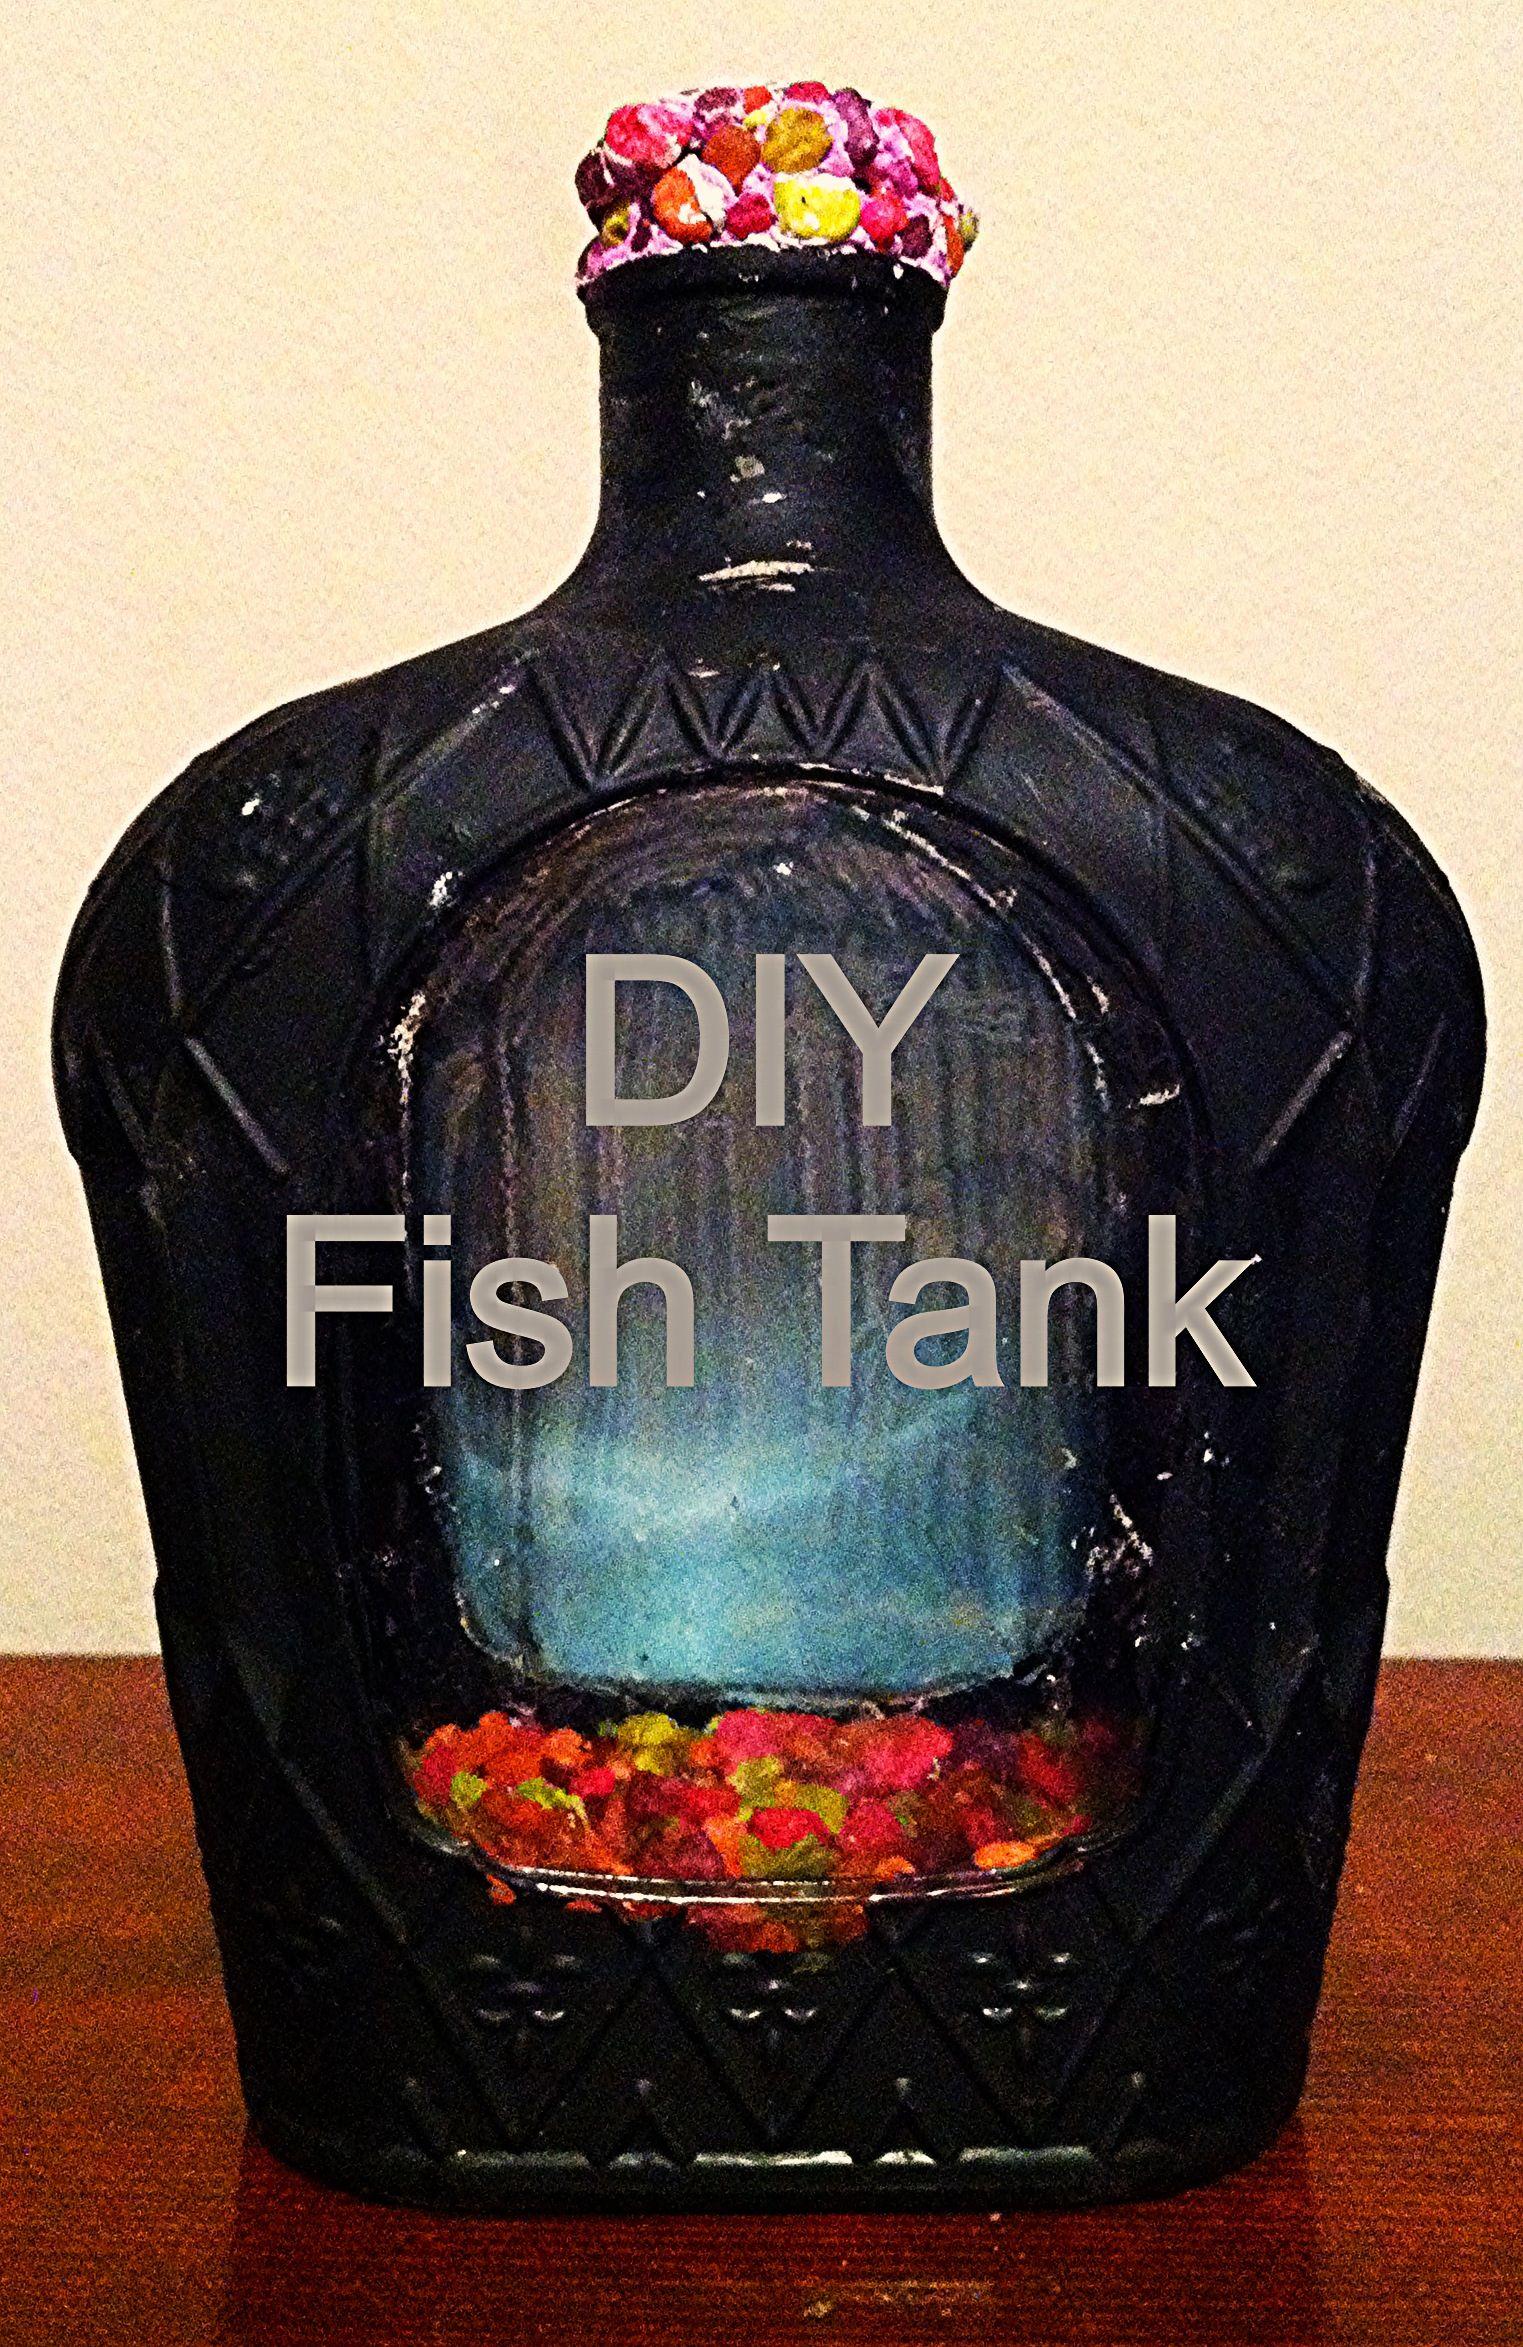 Aquarium fish tank diy - Diy Fish Tank From Crown Royal Bottle